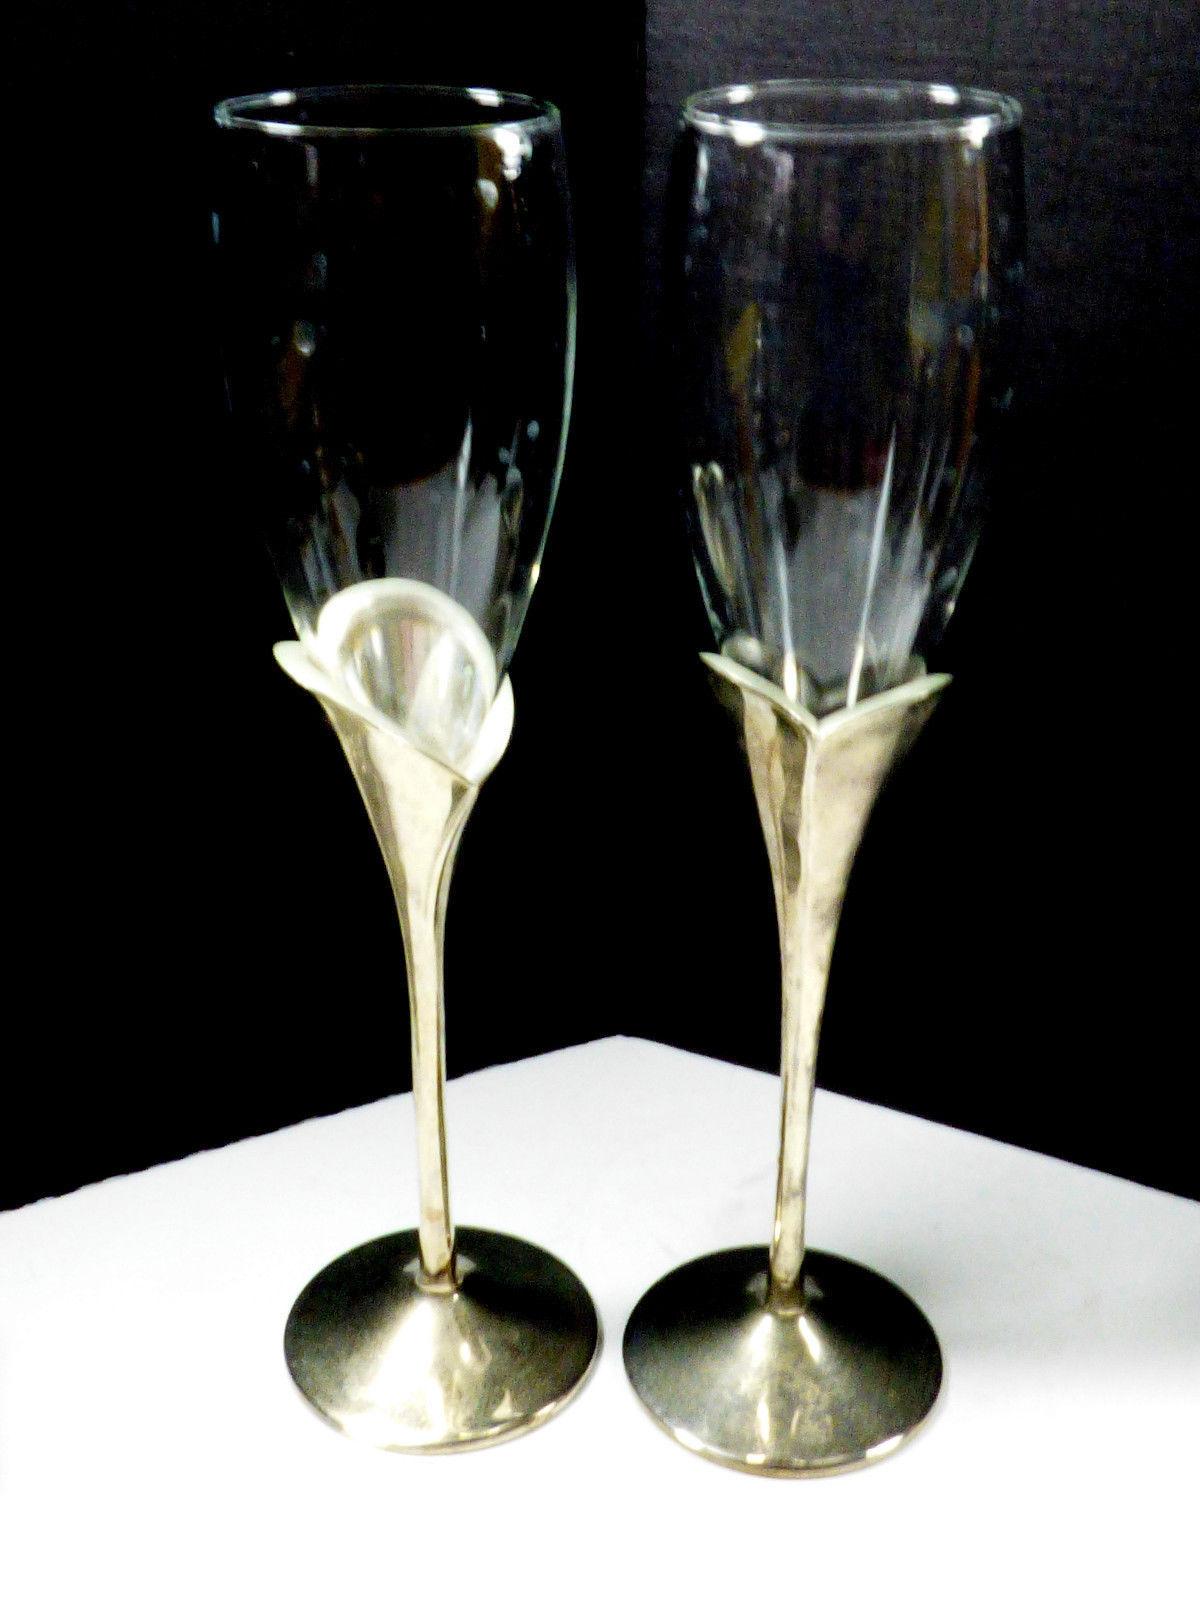 2 LENOX Crystal Champagne Flute Wedding Anniversary Silverplate Stems Heart